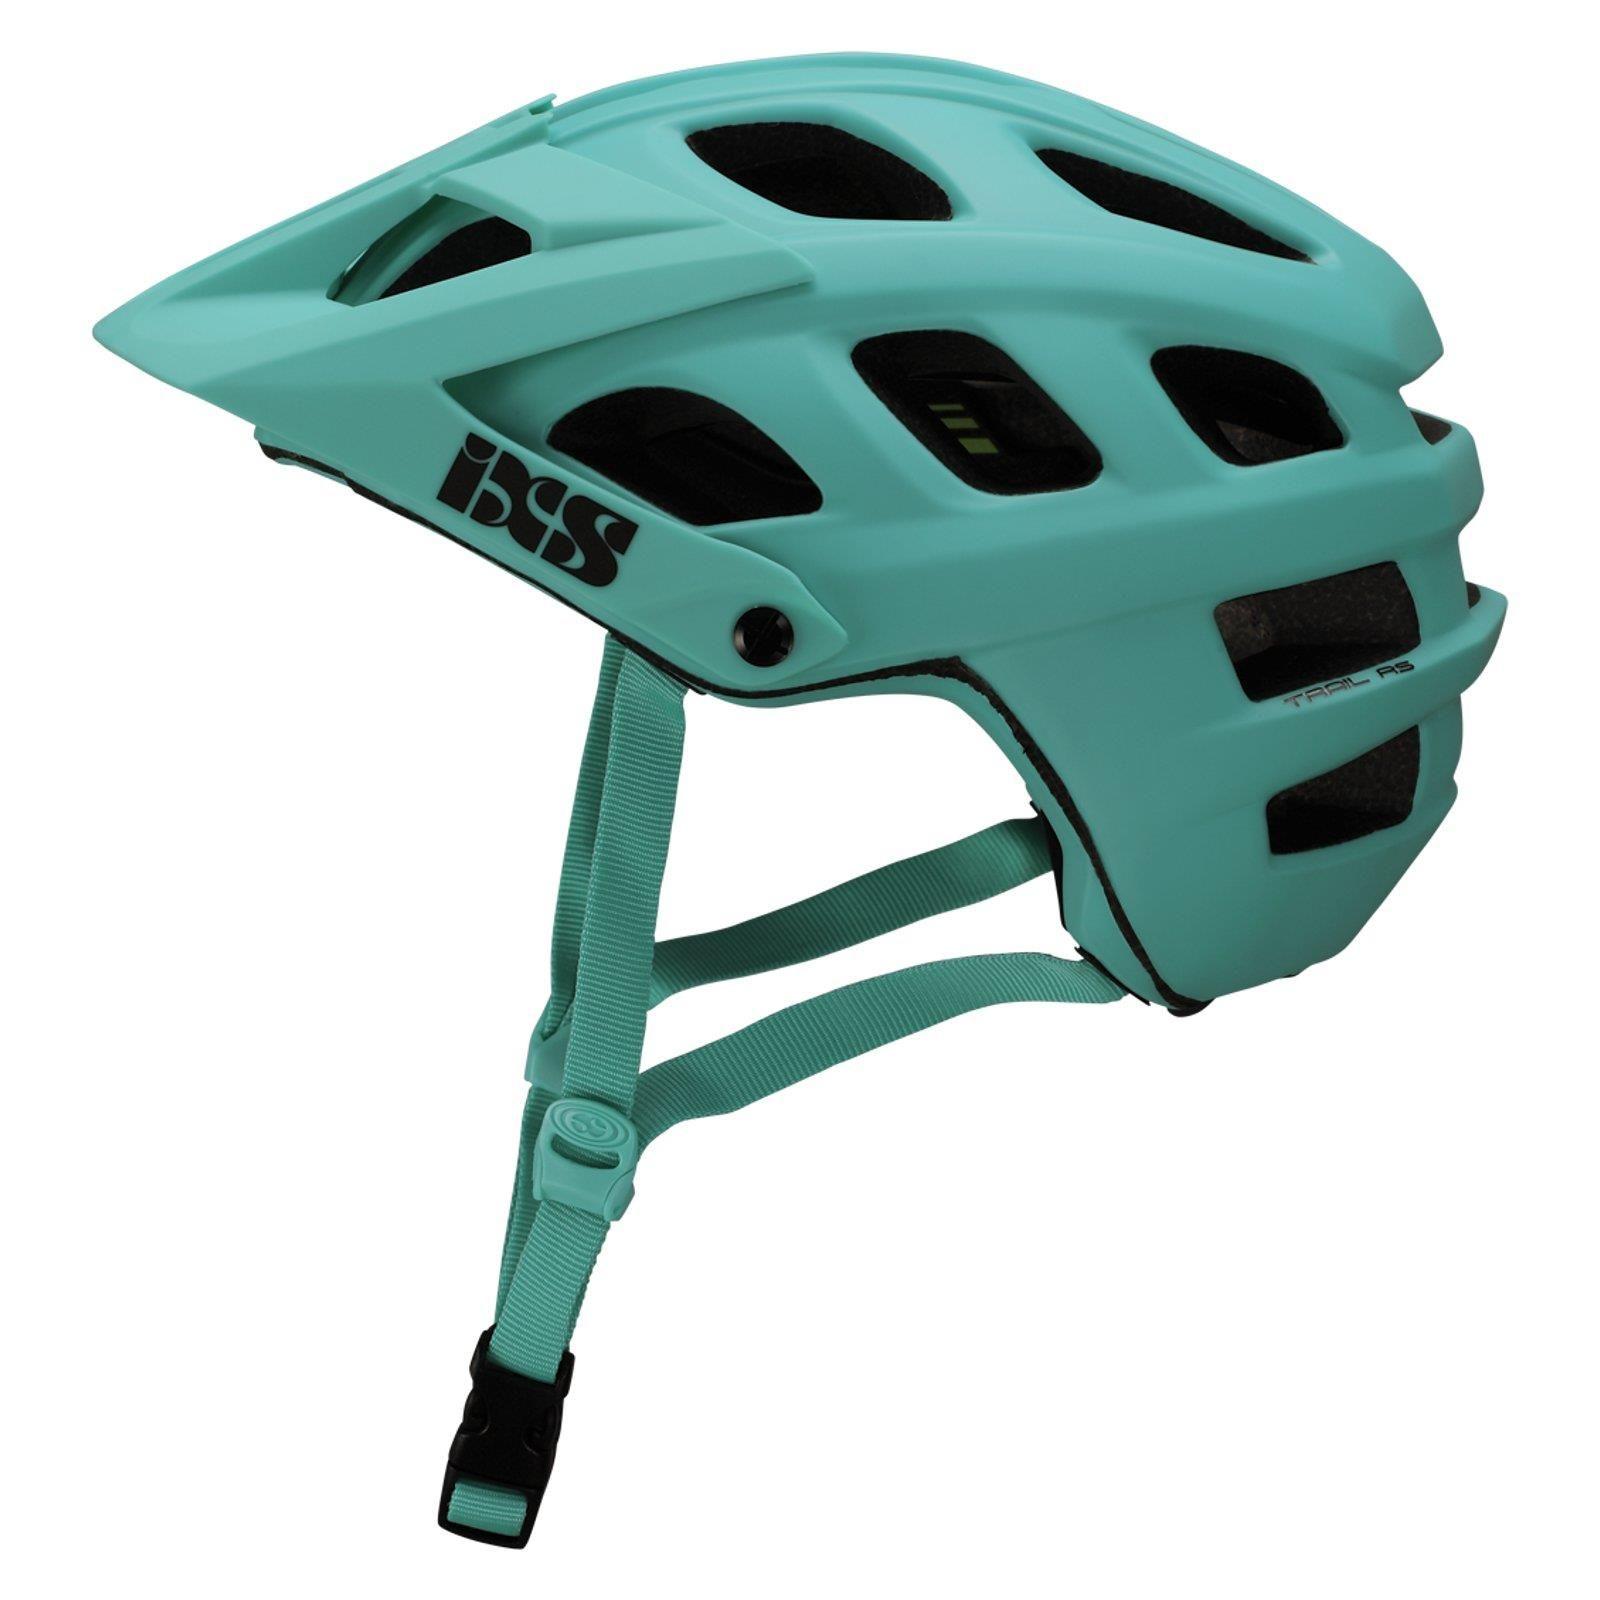 Ixs Trail Rs Evo Fahrrad Helm All Mountain Bike Am Mtb Enduro Dh Downhill Inmold Ad Sponsored Evo Fahrrad Helm All Mountain Bike Mountain Biking Bike